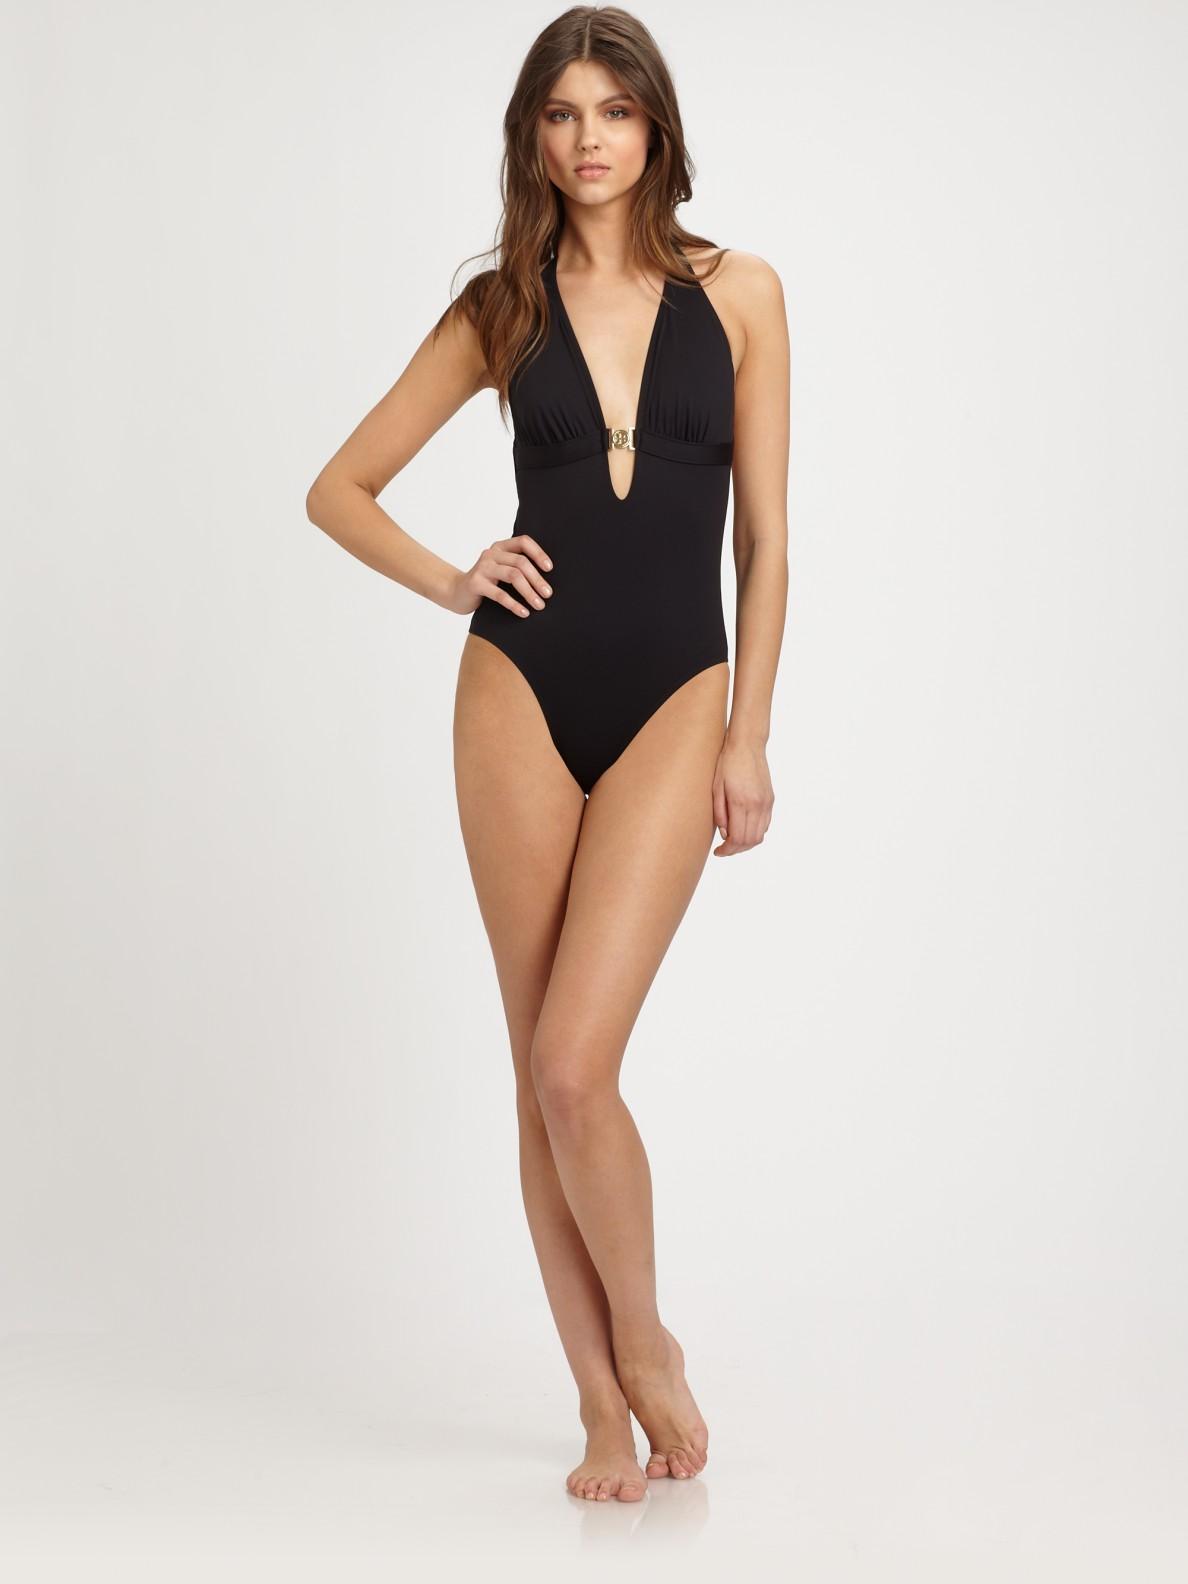 881c716c3103 Tory Burch One-piece Halter Swimsuit in Black - Lyst